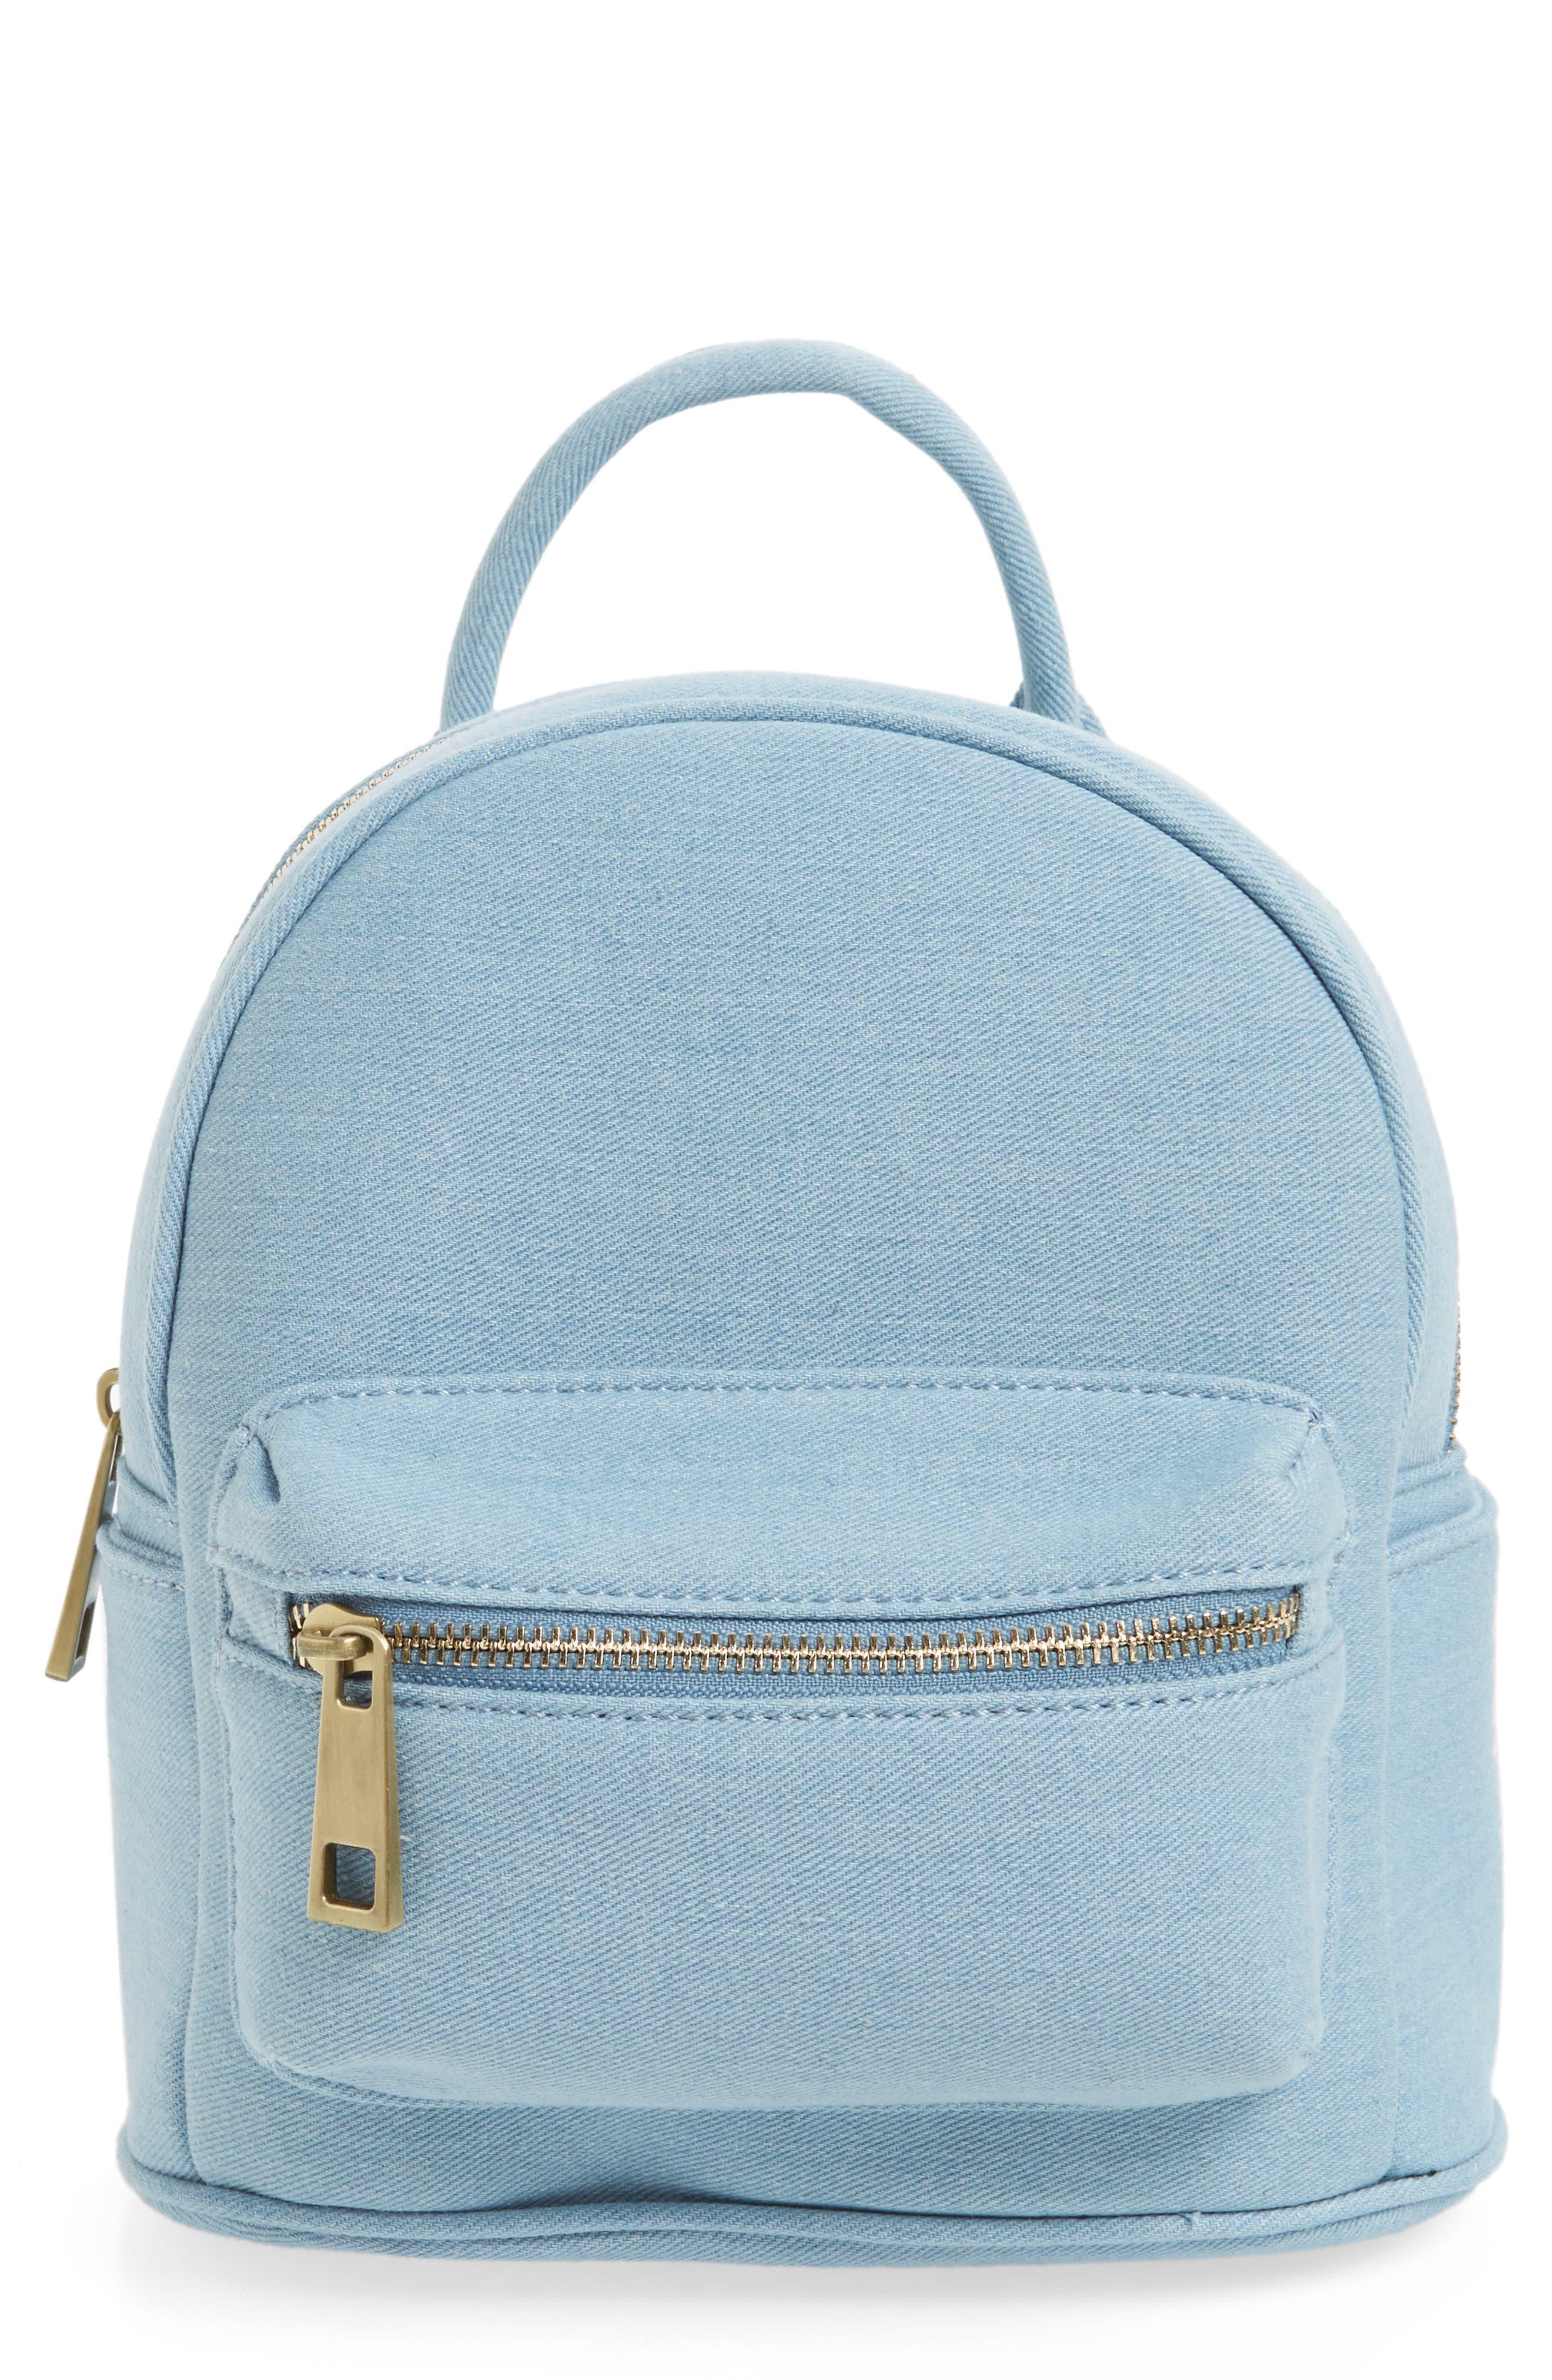 Alternate Image 1 Selected - Street Level Mini Backpack